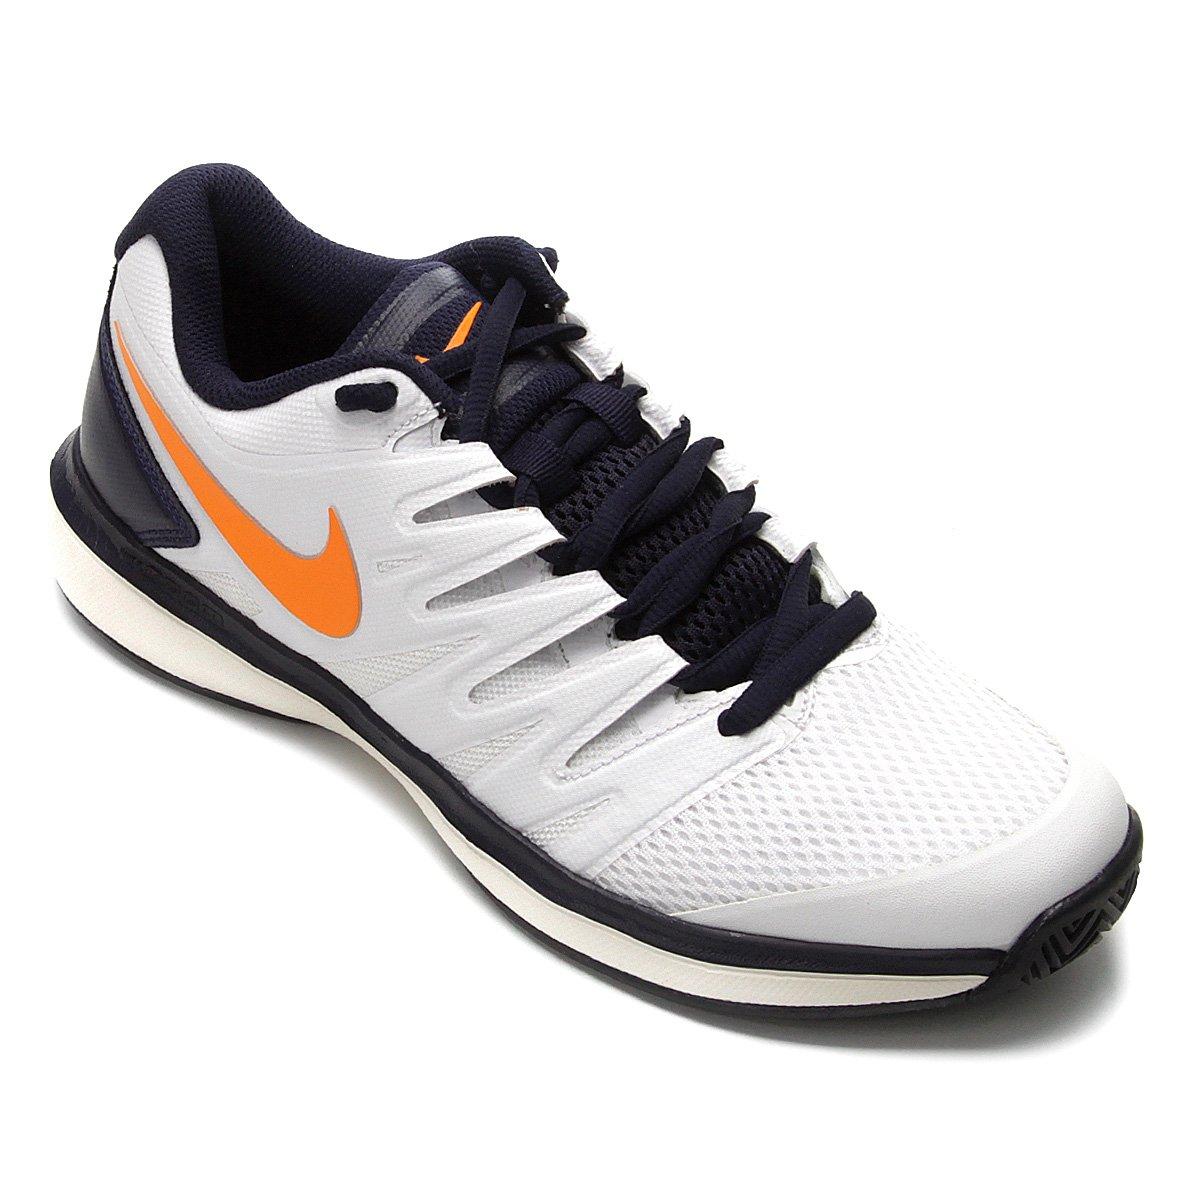 47fe59fca Tênis Nike Air Zoom Prestige Prestige Zoom HC Masculino Compre Agora  Netsapatos bda608